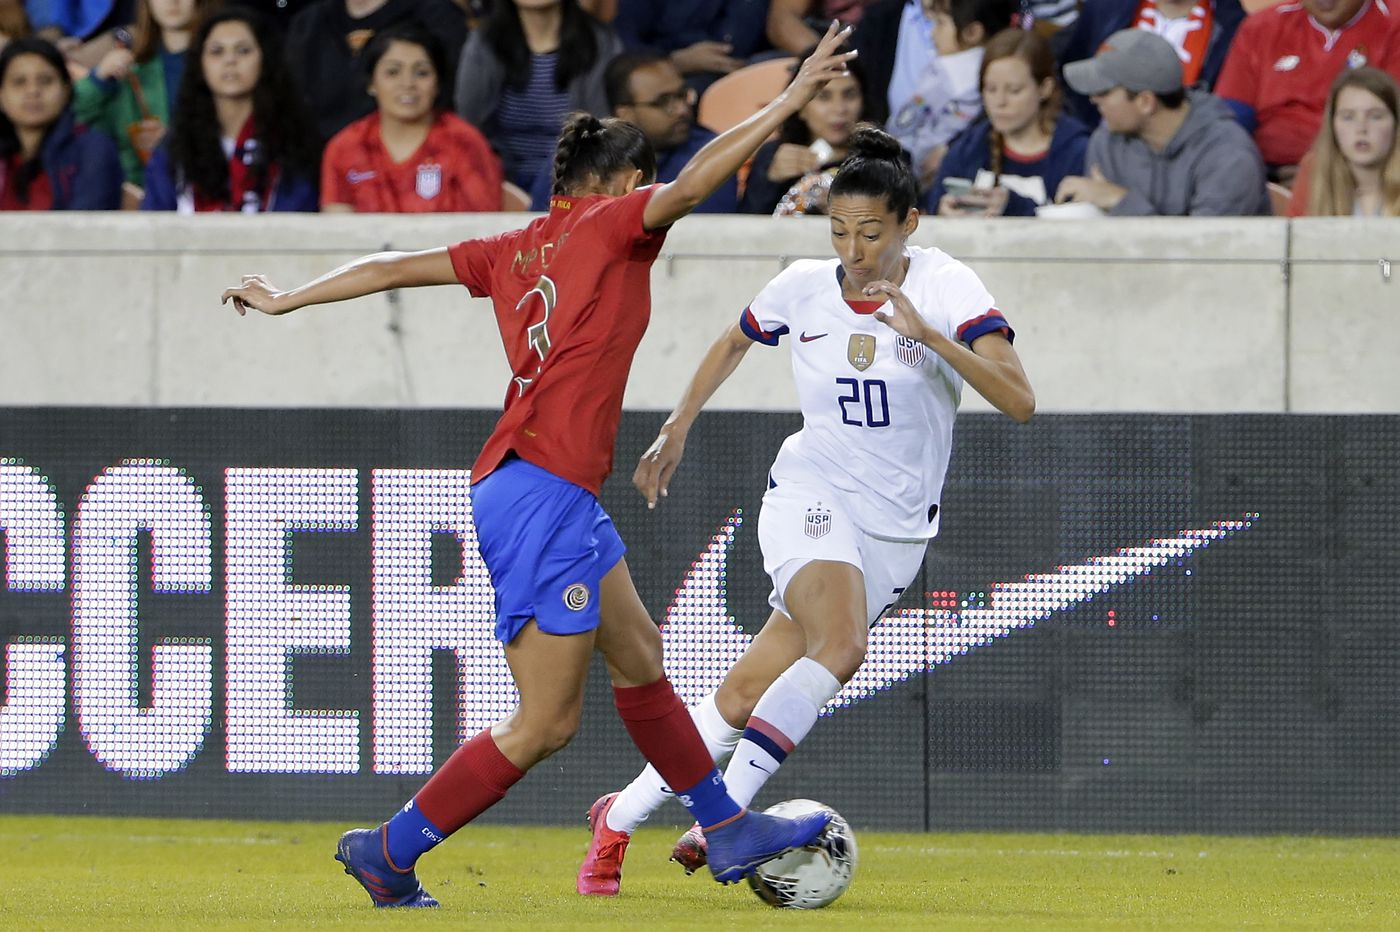 U.S. women beat Costa Rica 6-0, win Olympic qualifying group